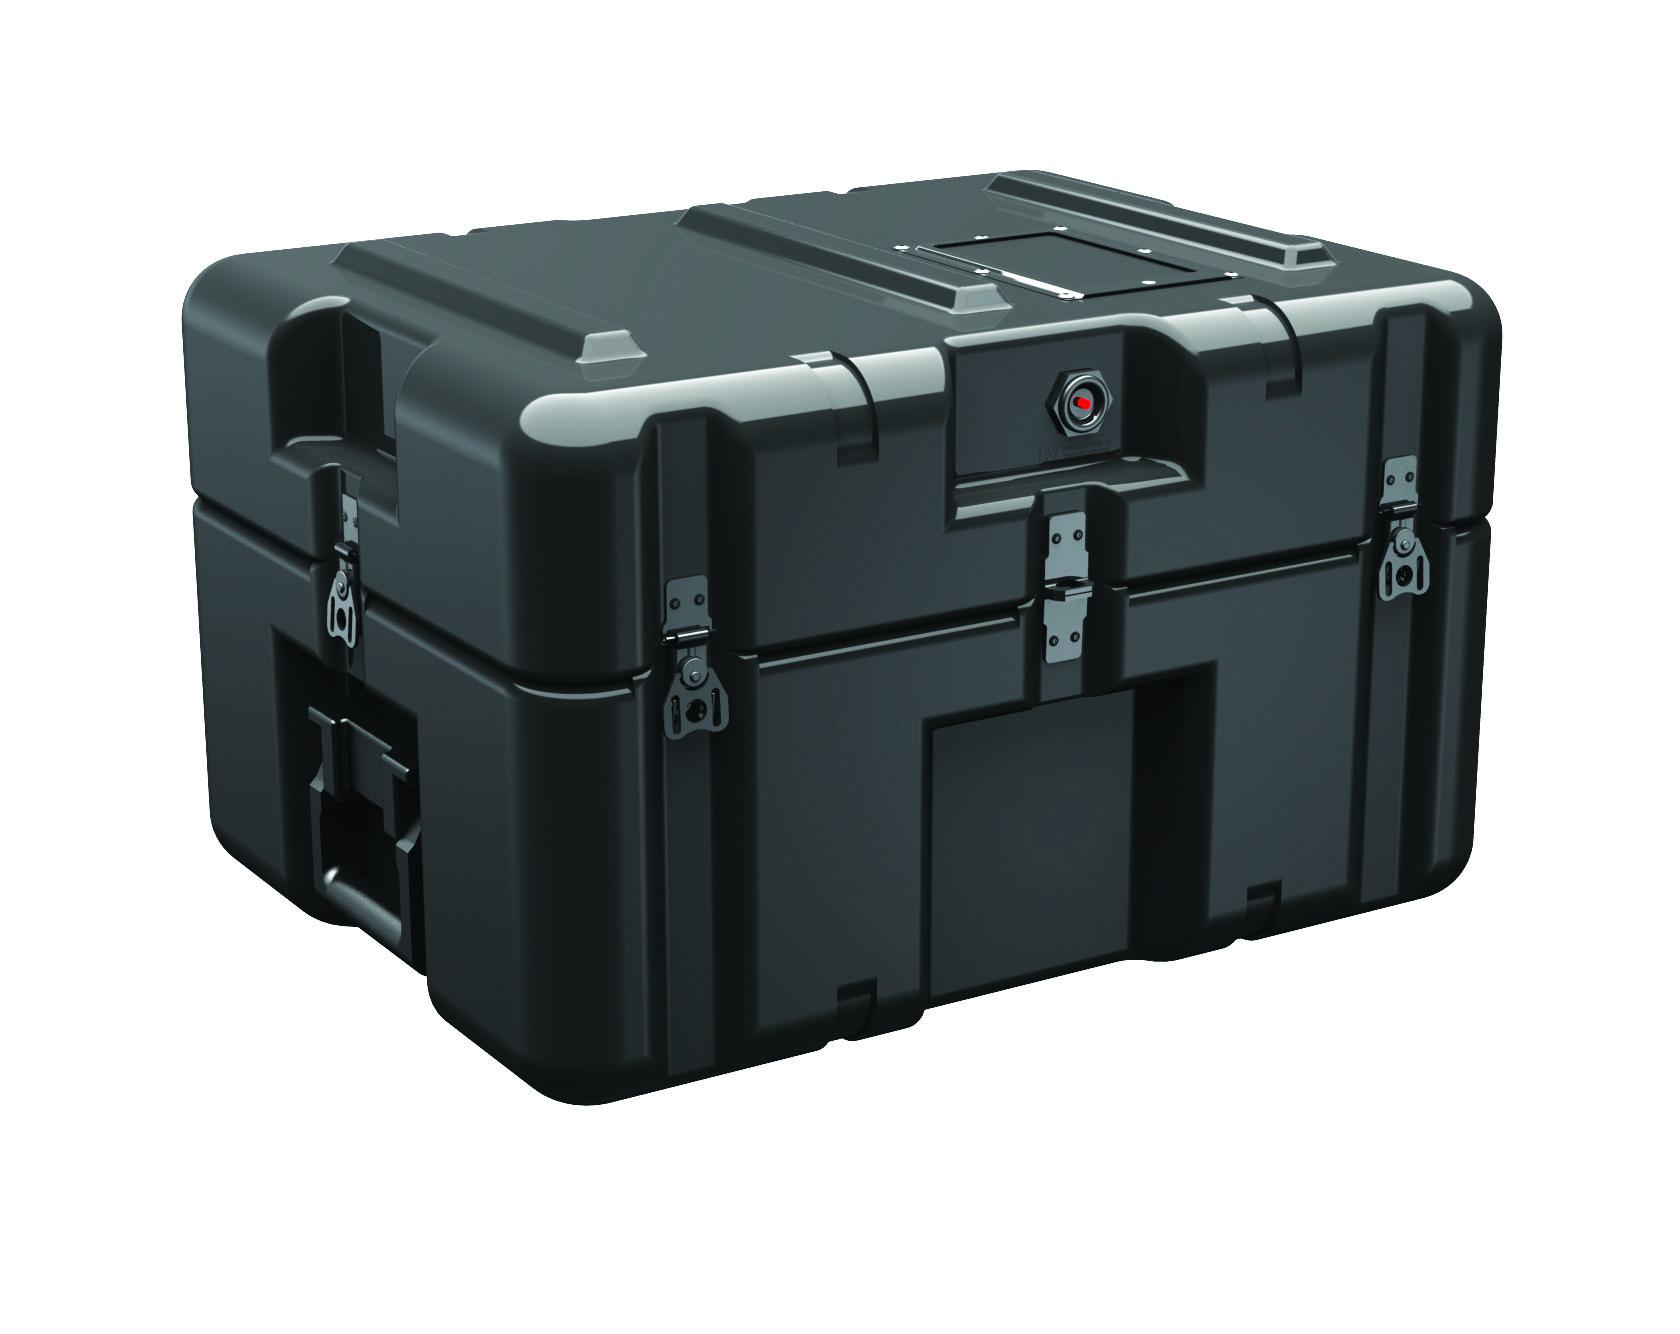 AL2216-0805 - AL2216-0805 single Lid Hardigg Case